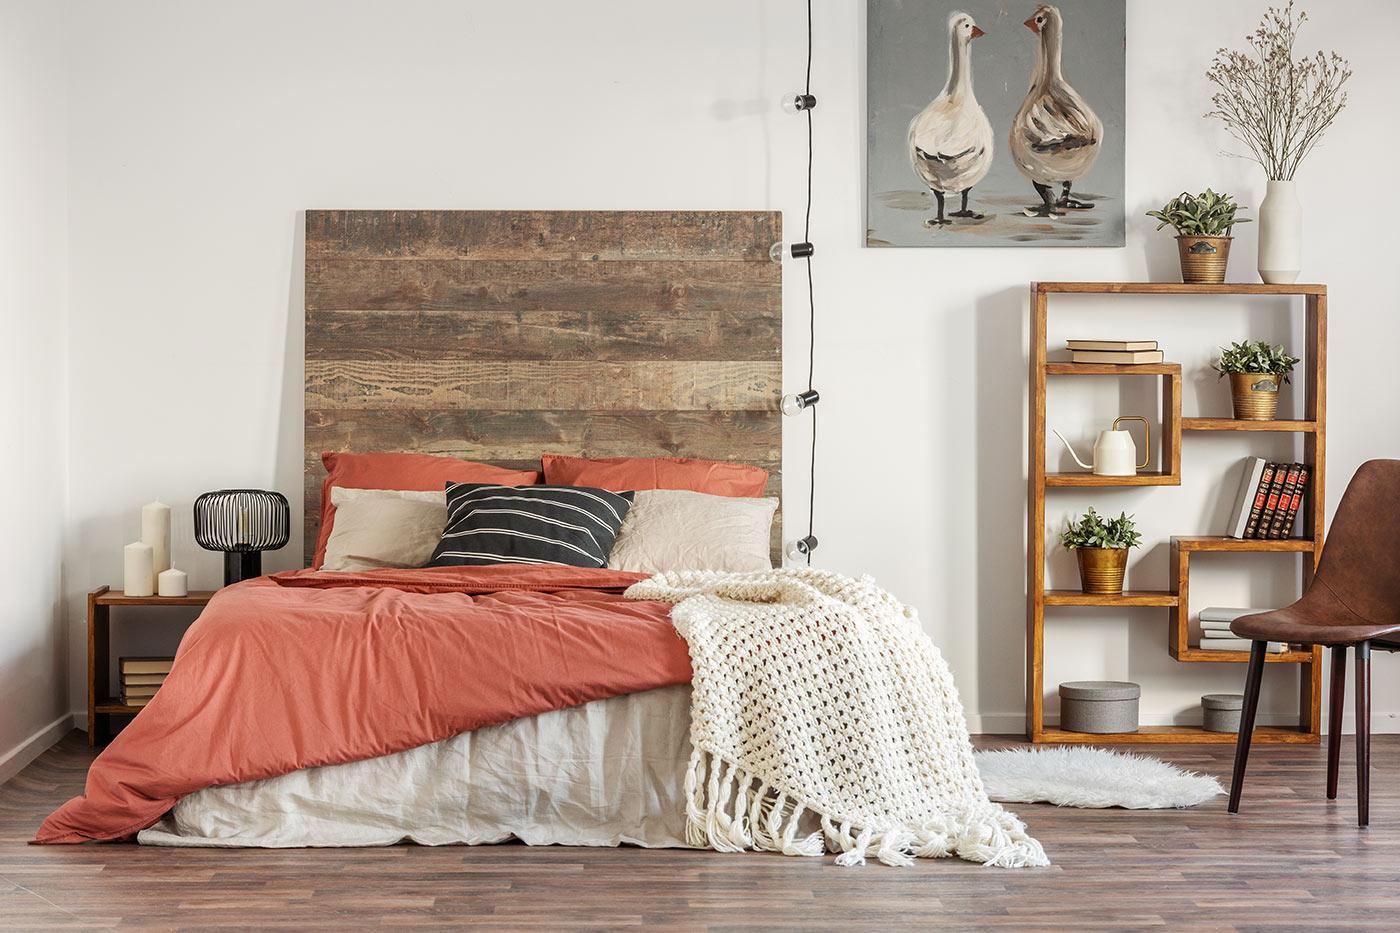 Arredo Rustico Moderno Cos E E Come Adattarlo A Casa Propria Man Casa